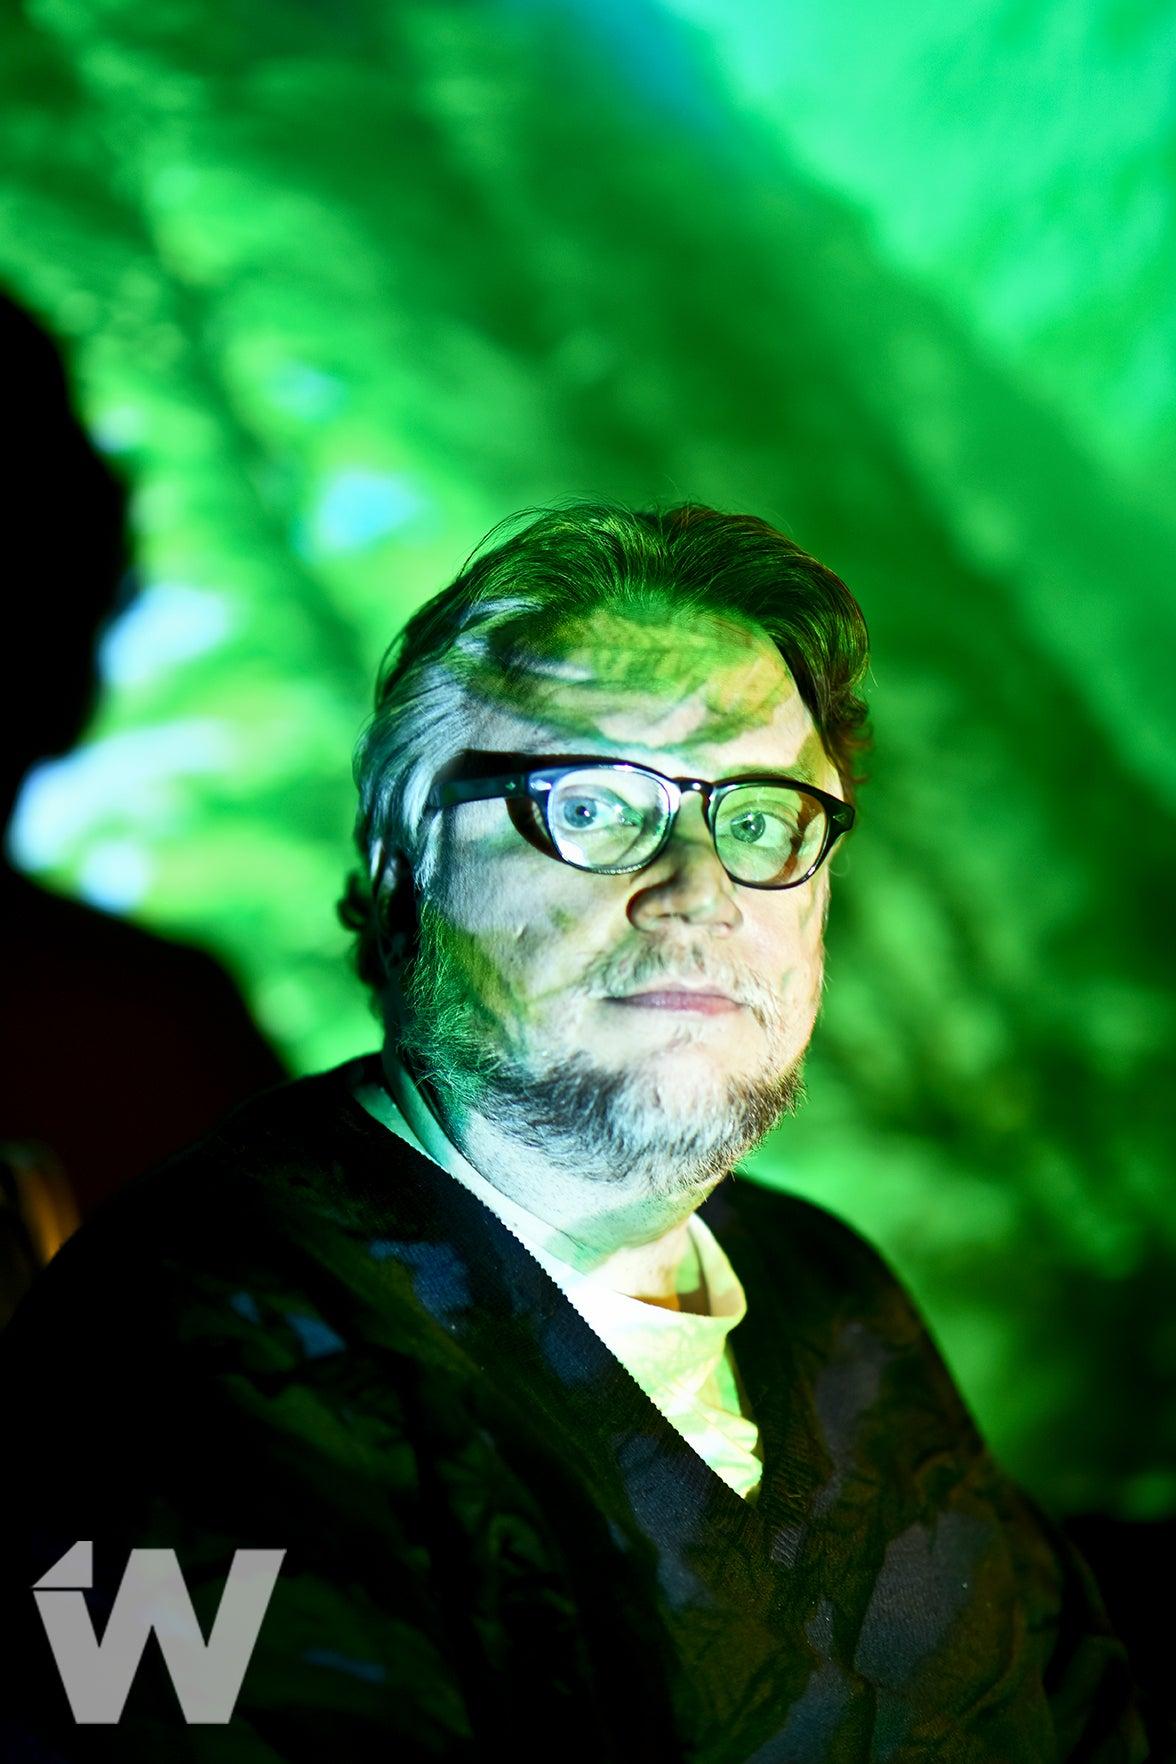 Guillermo del Toro, Shape of Water